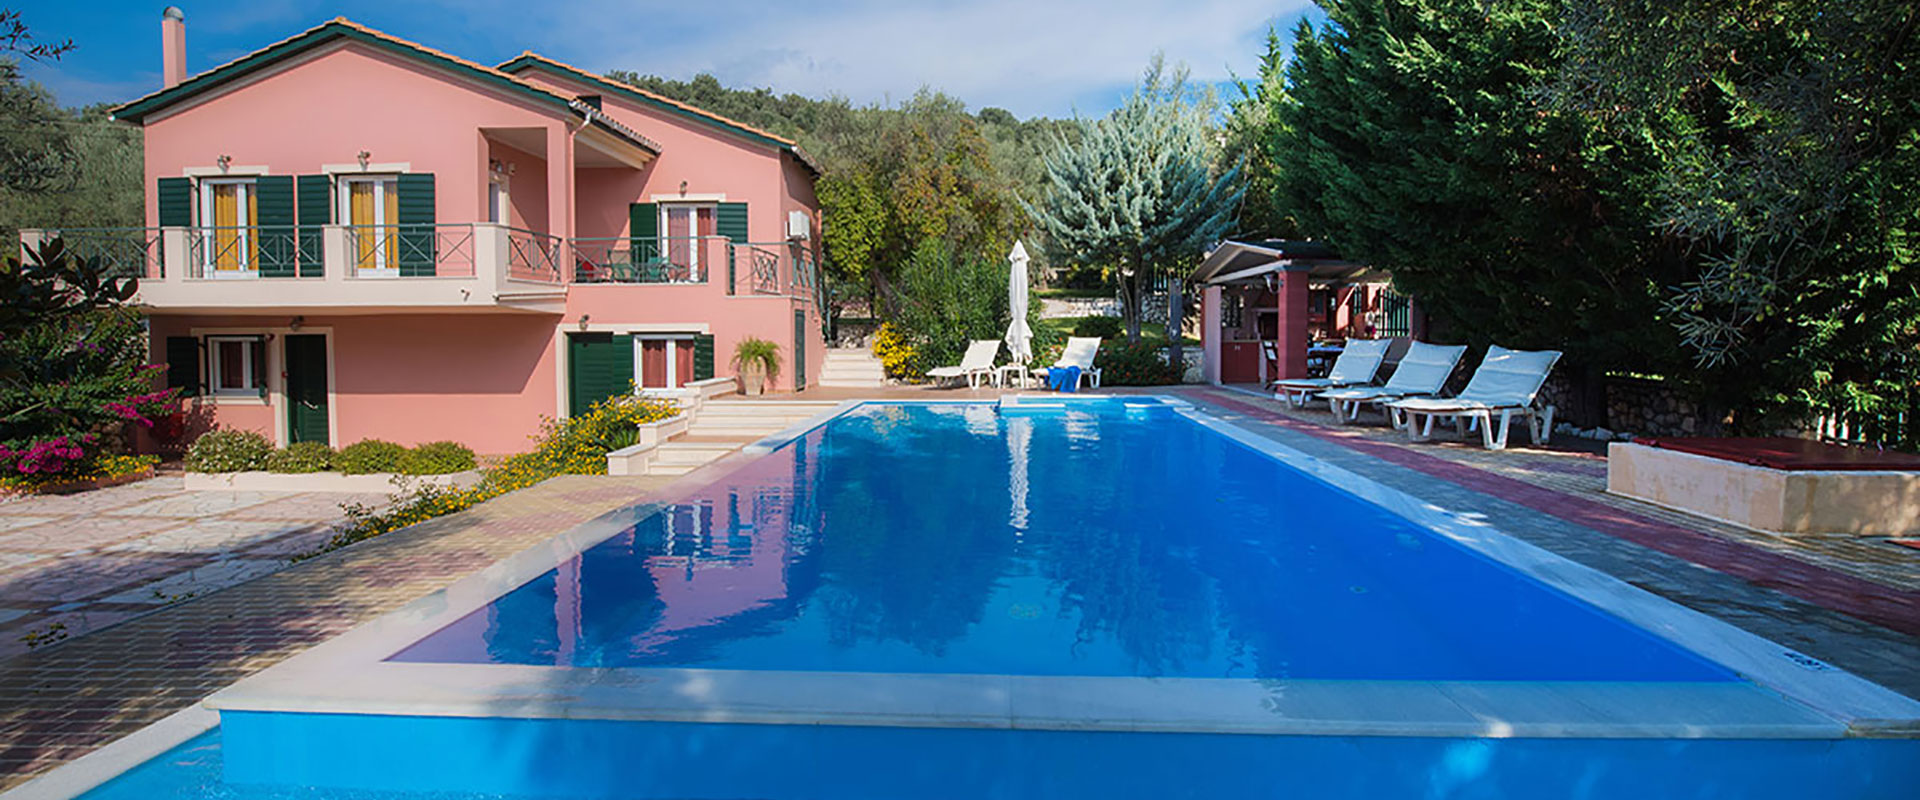 private swimming pool for each villa